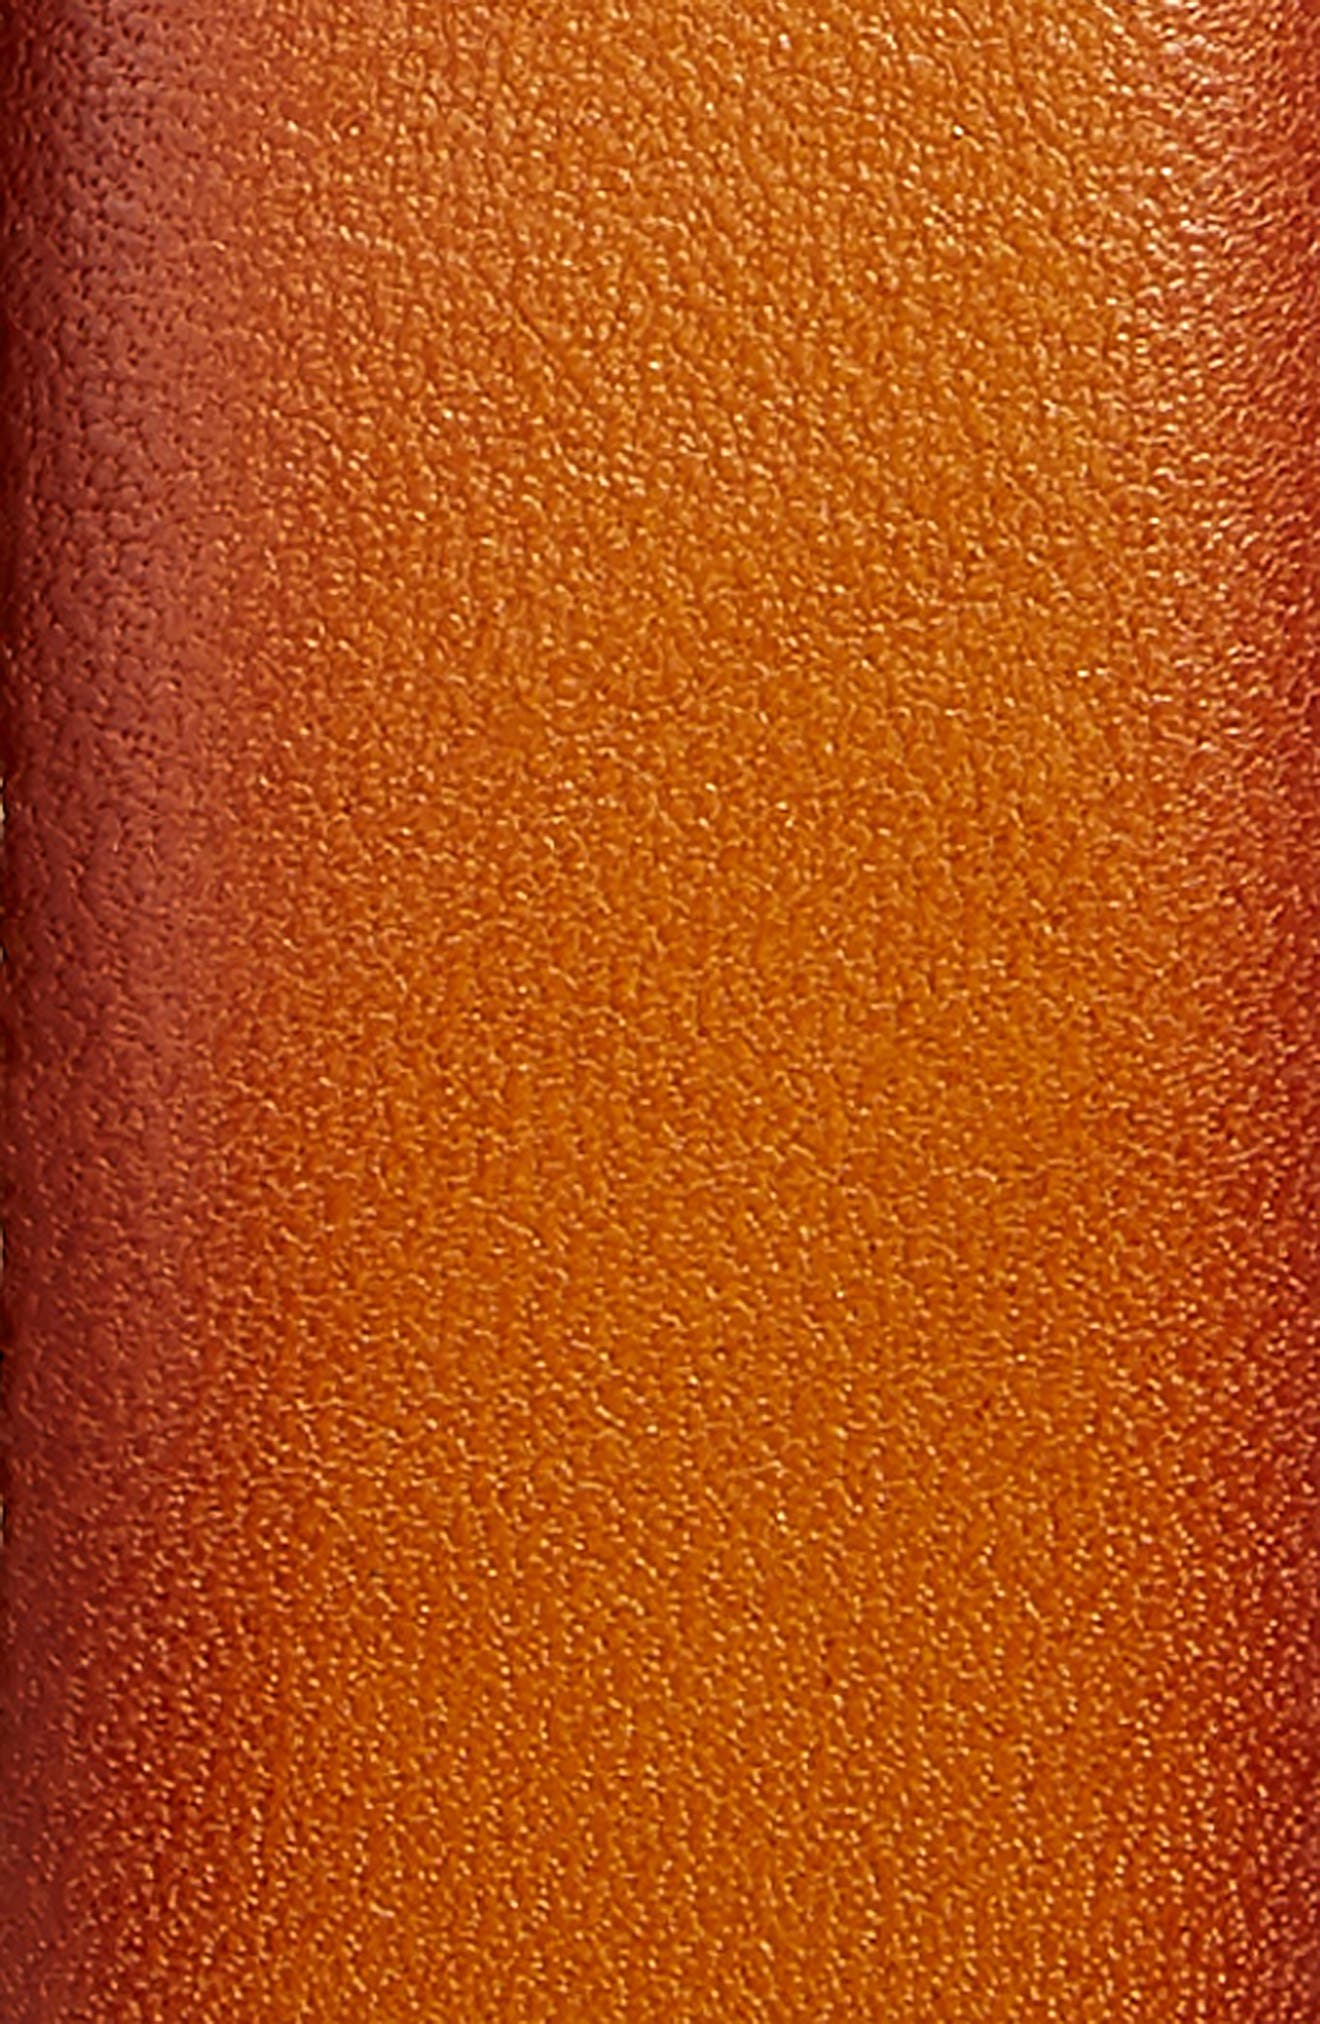 Marco Burnished Leather Belt,                             Alternate thumbnail 2, color,                             Cognac